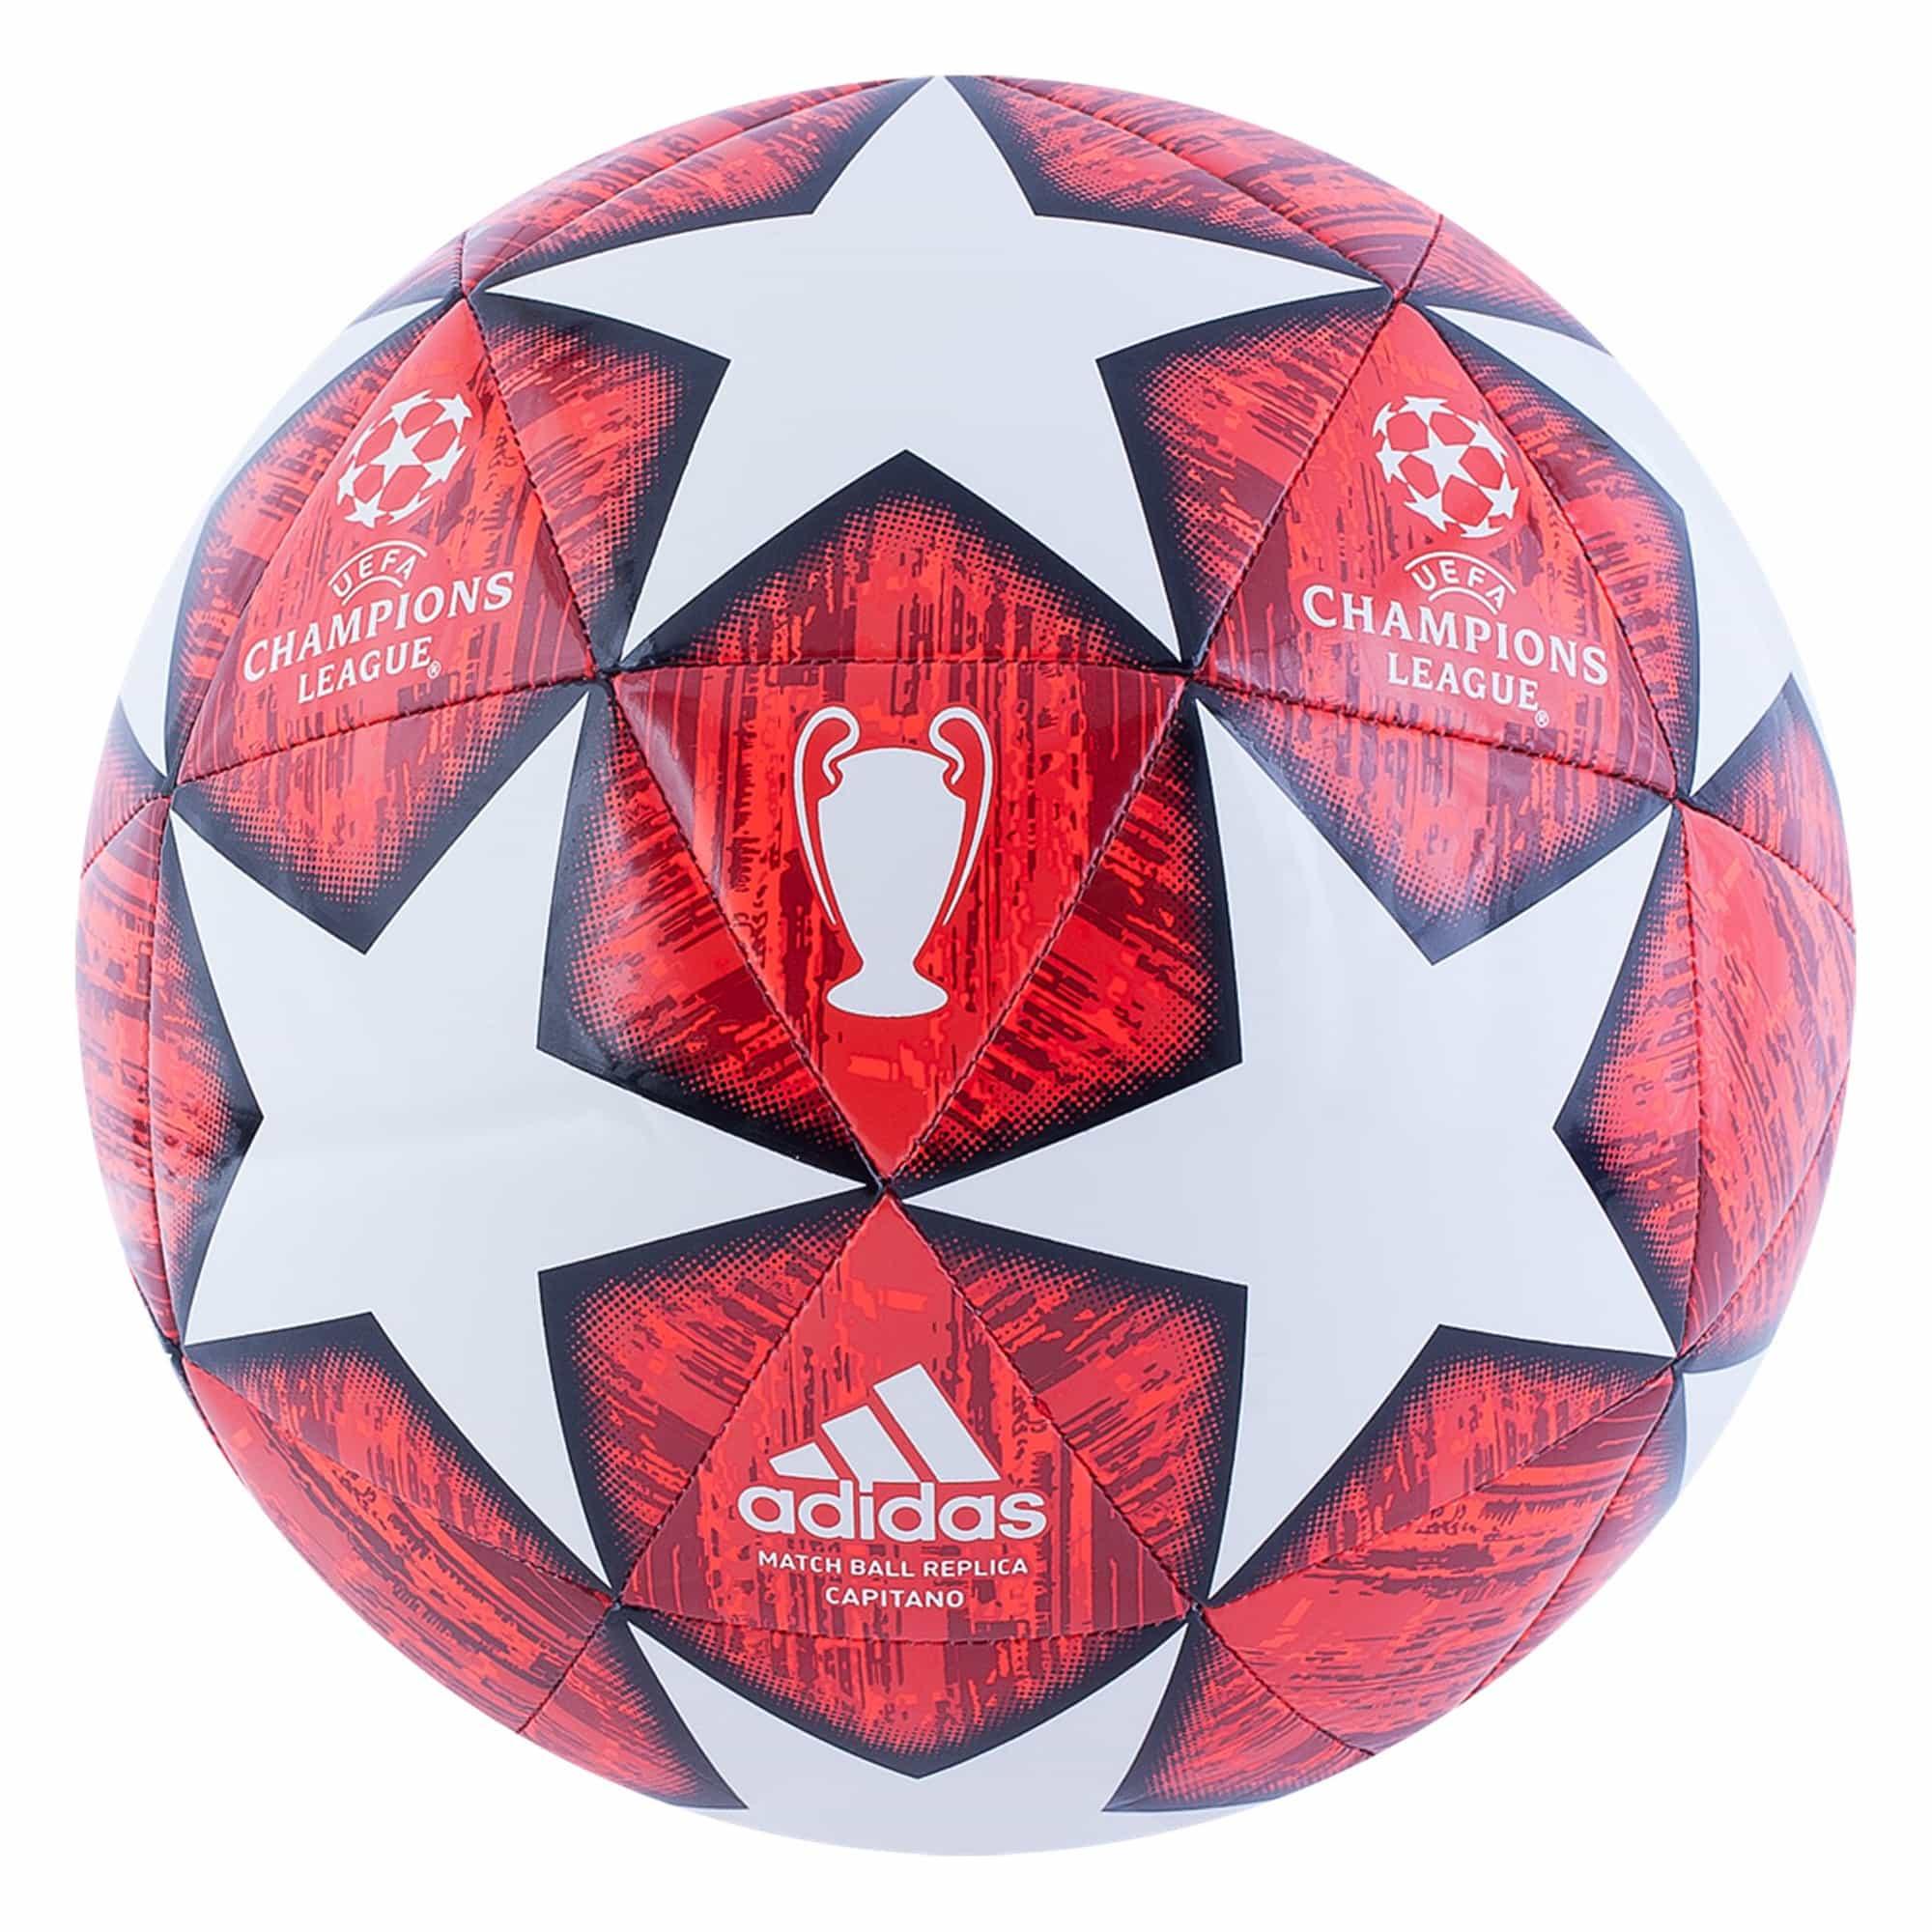 479e04252a0 adidas Finale Madrid Capitano Soccer Ball – madaboutsoccer